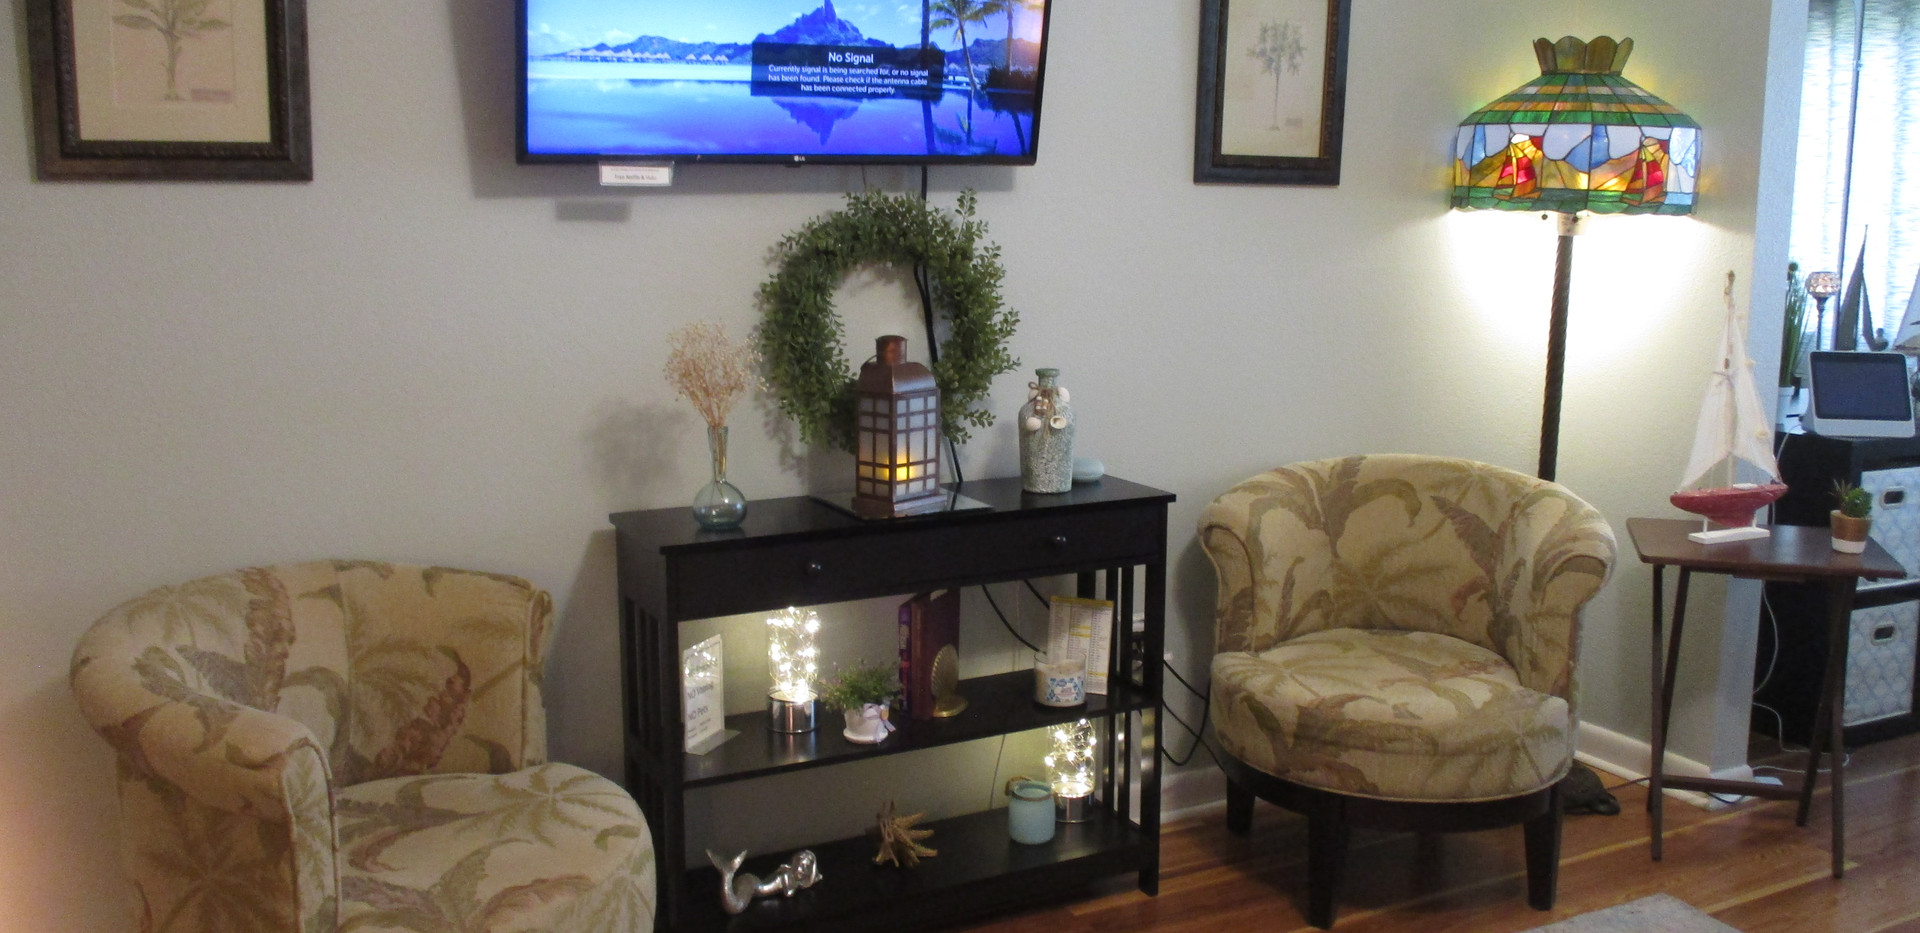 Cable TV beautiful decor